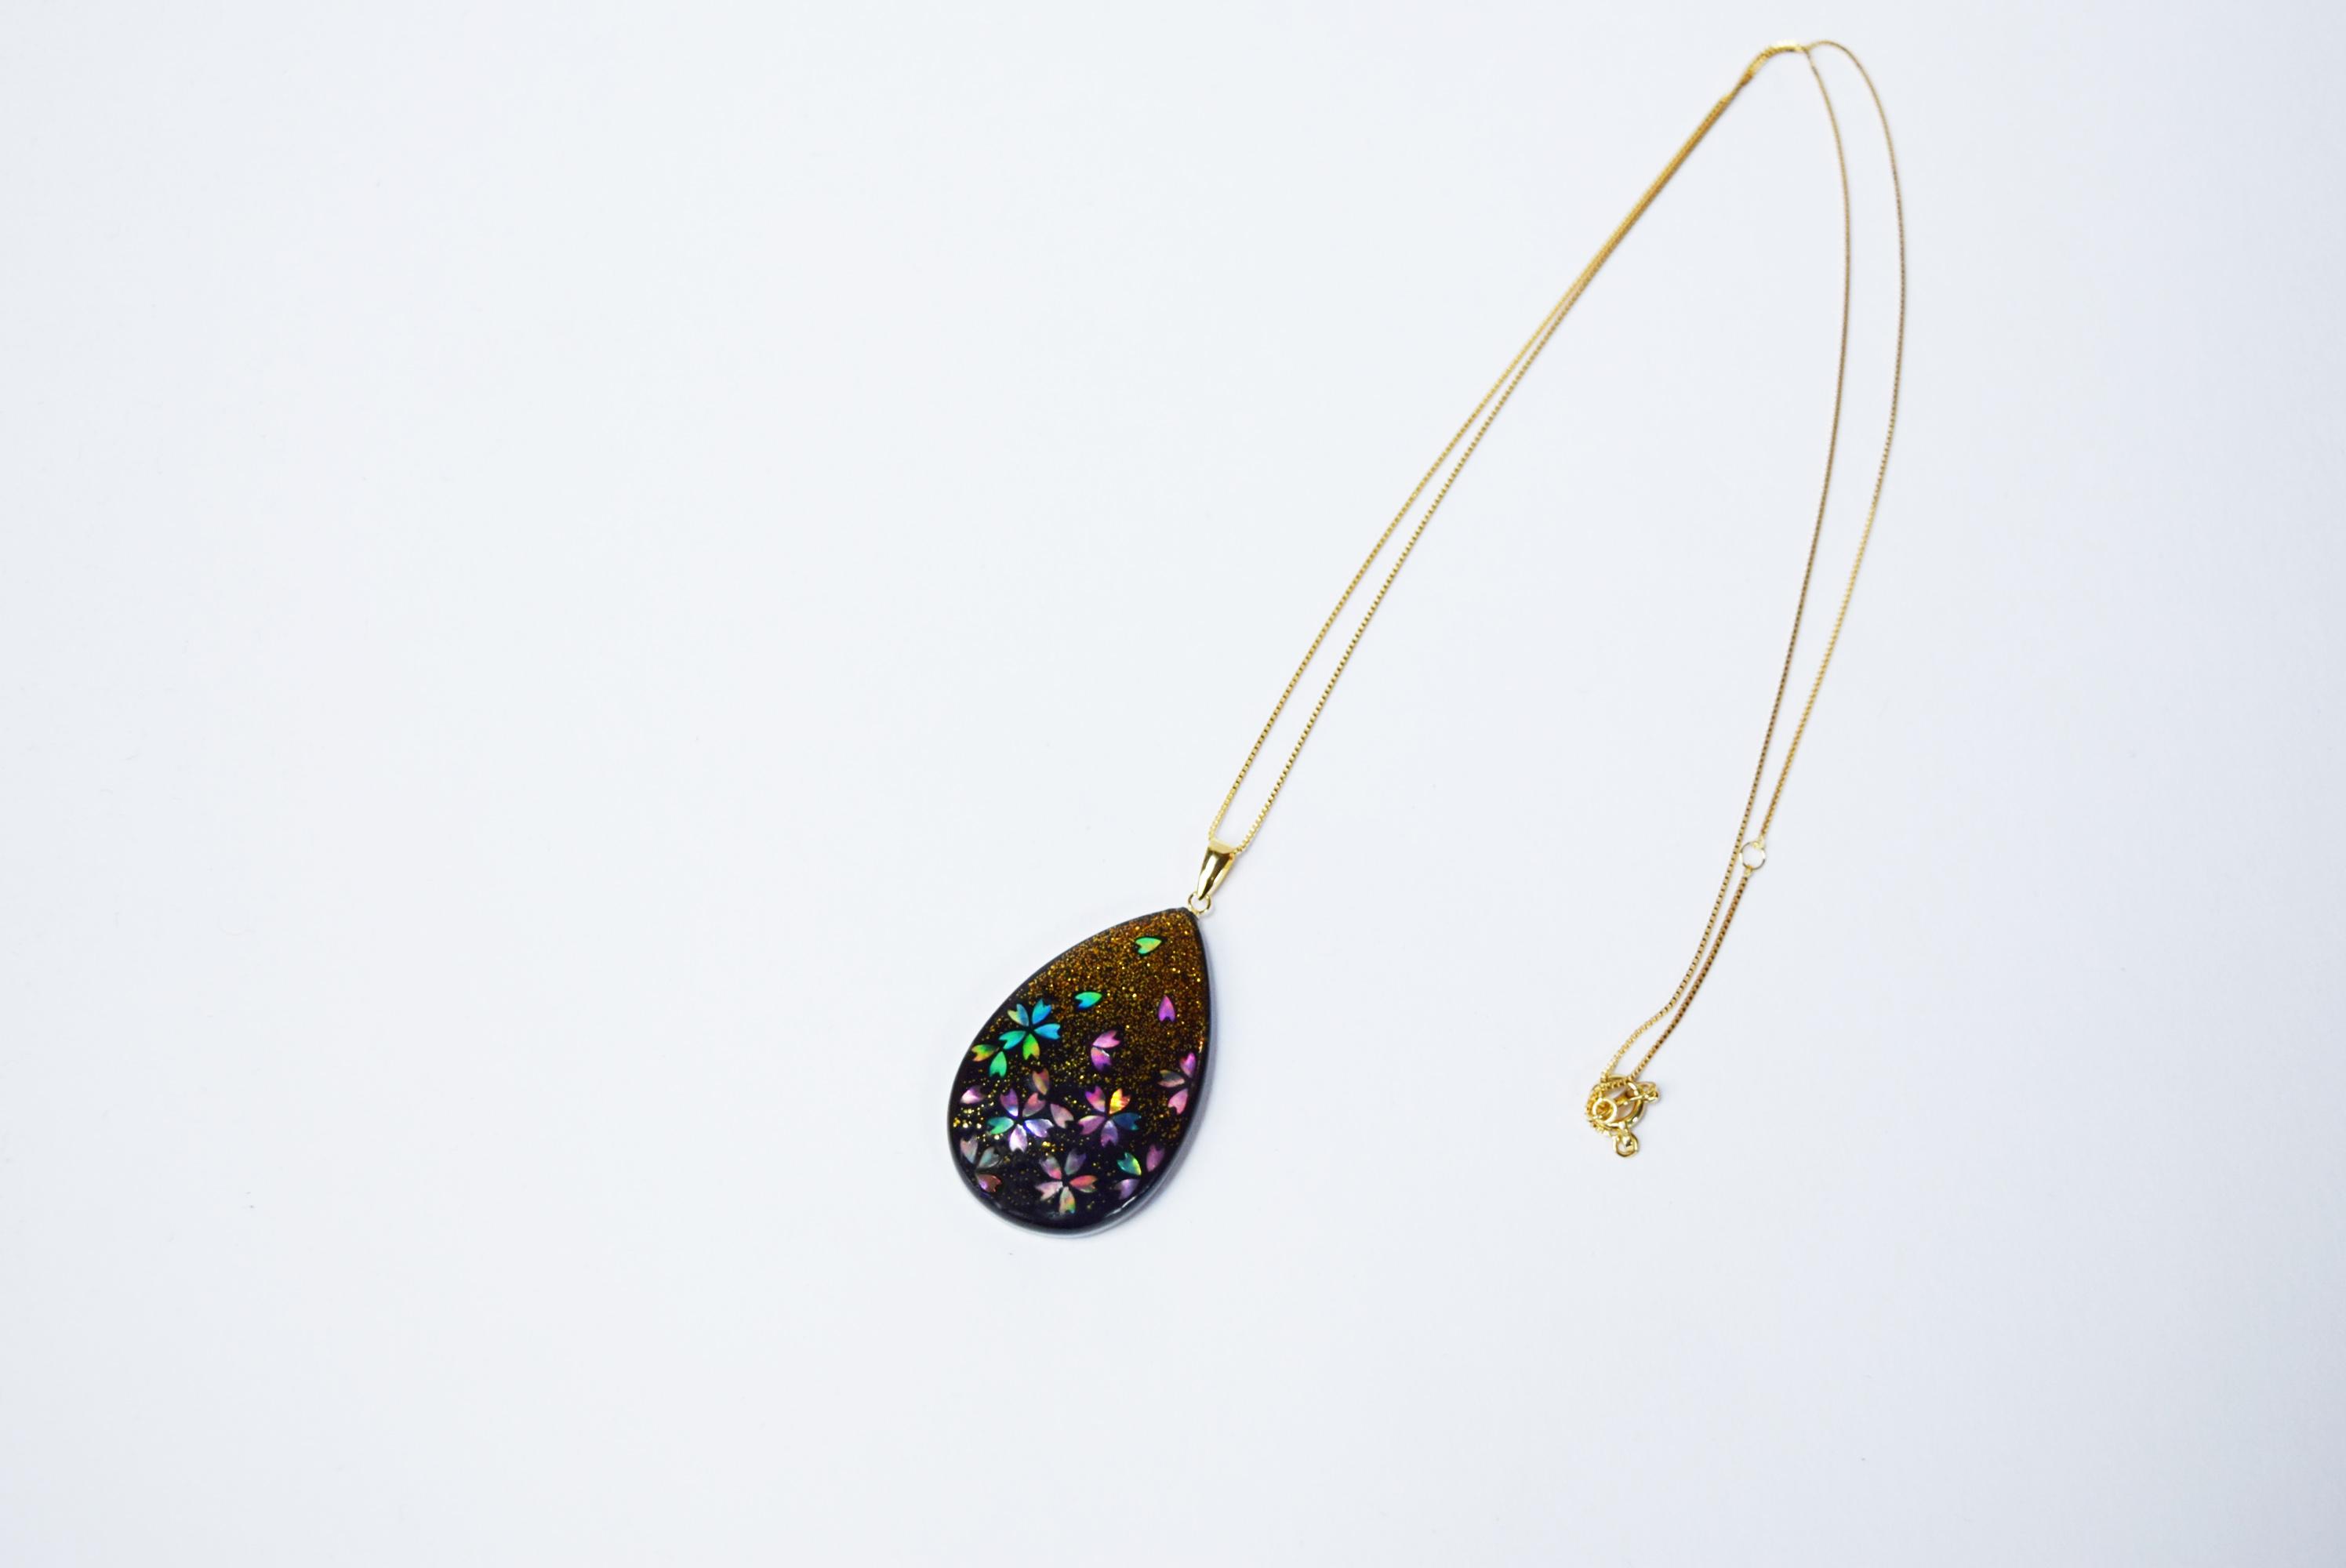 raden_necklace_mamori_sakura_teardrop_mix